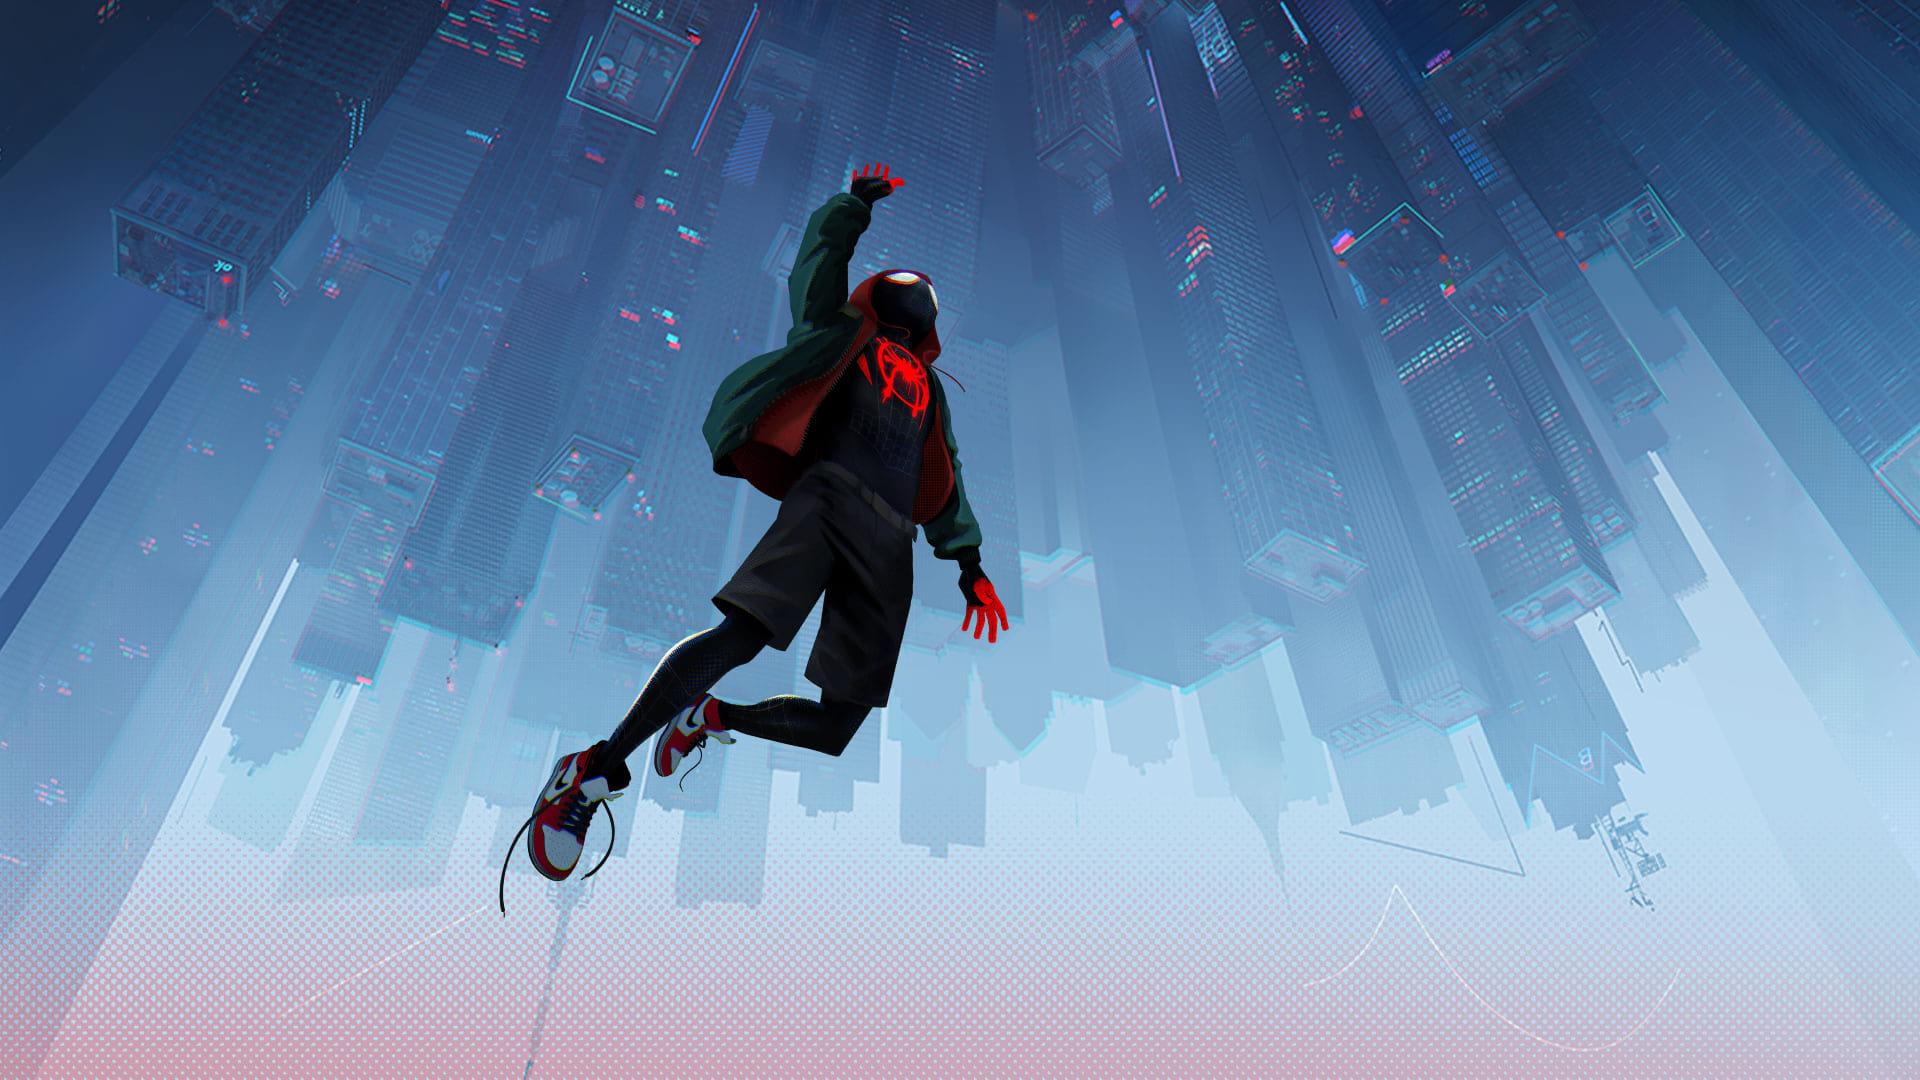 Image: Spider-Man: Into the Spider-Verse/TMDb